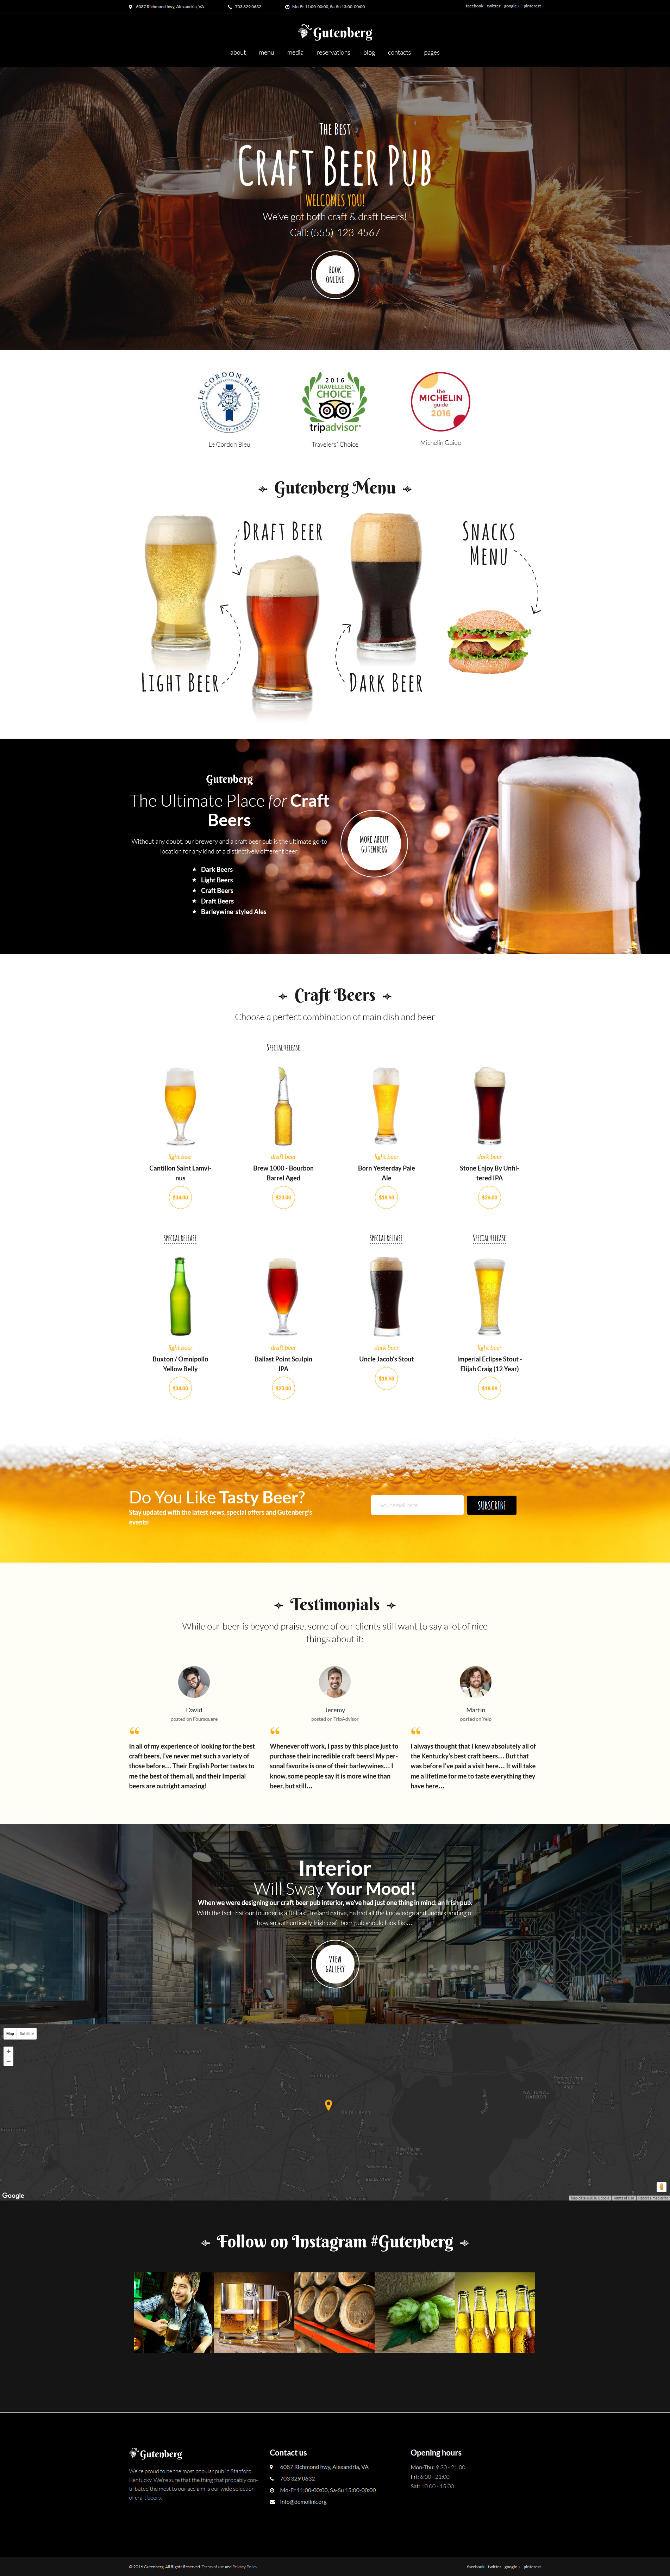 "Template WordPress #59005 ""GutenBerg - Beer Pub and Brewery"""